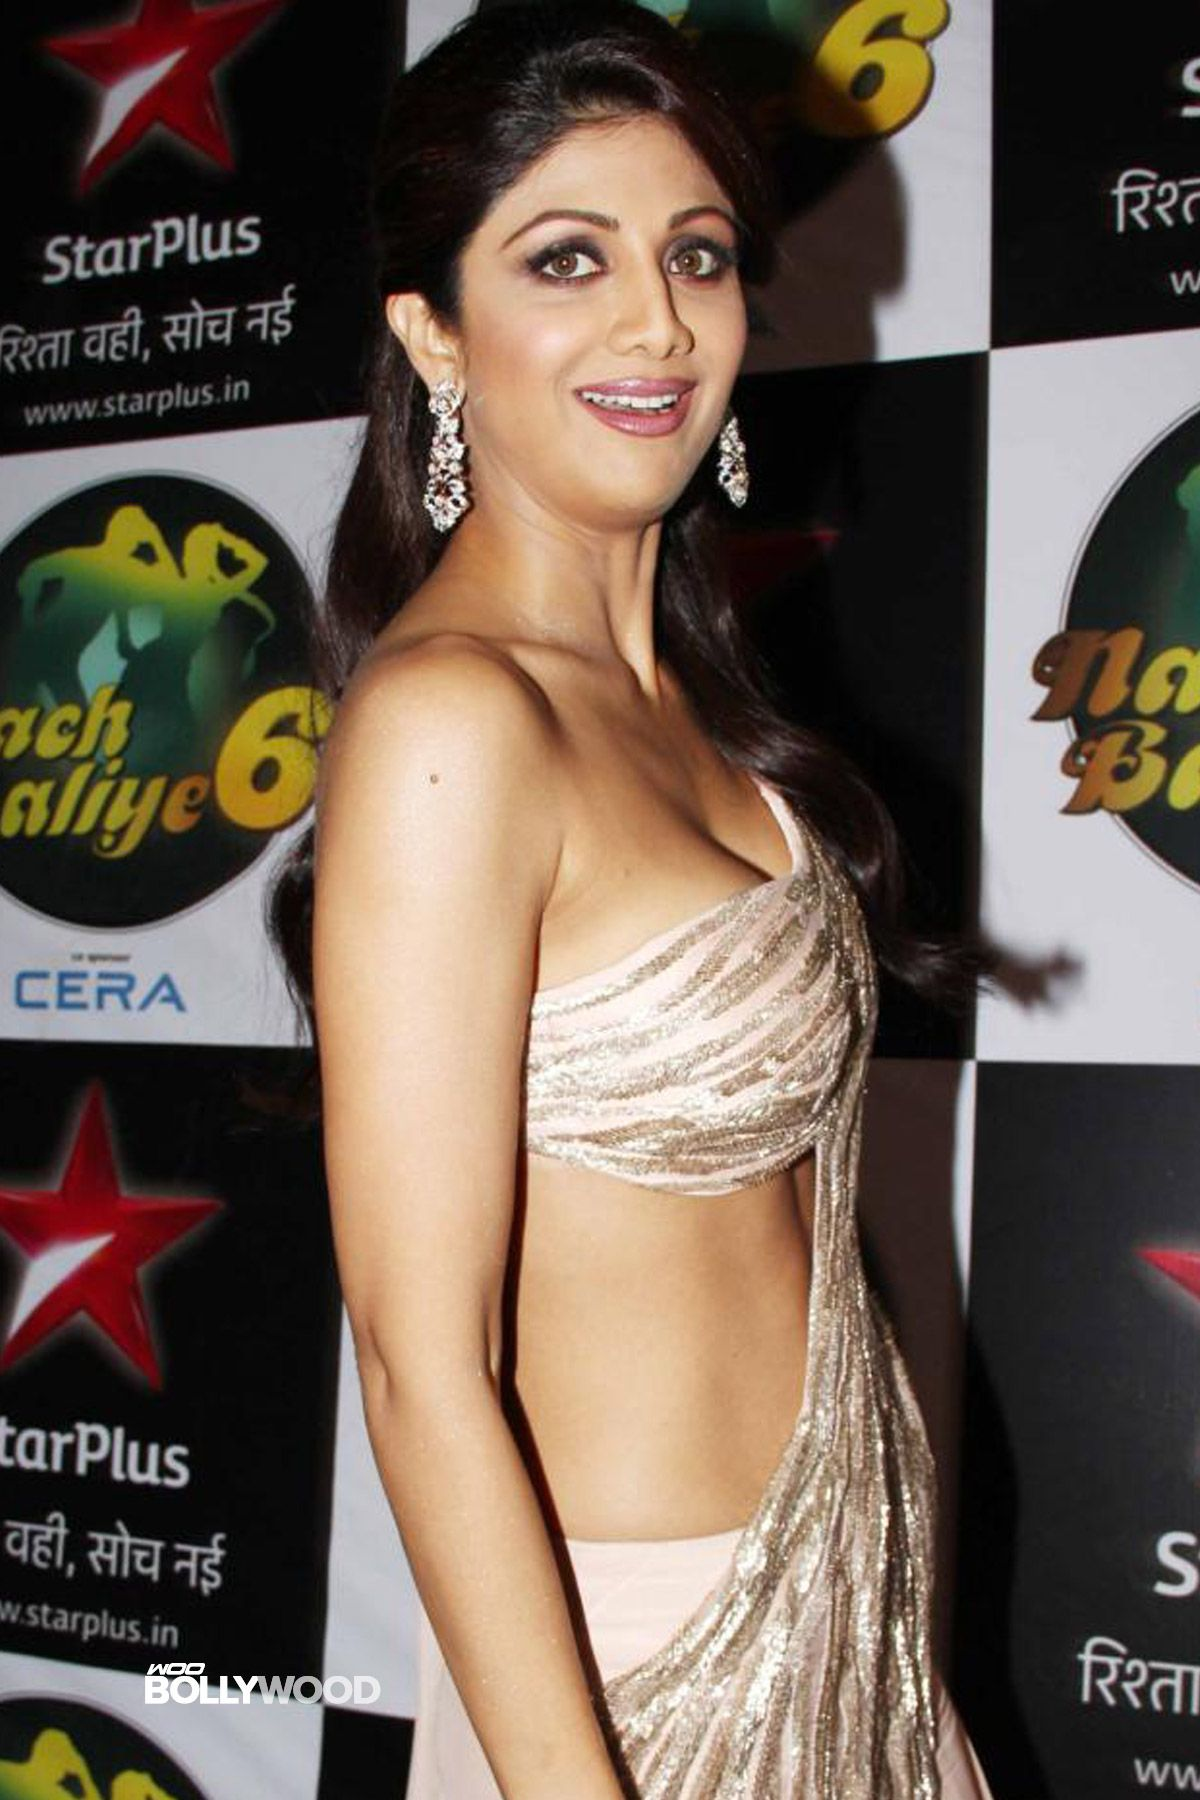 Shilpa Shetty Hot - Google Search  Shilpa Shetty -8349